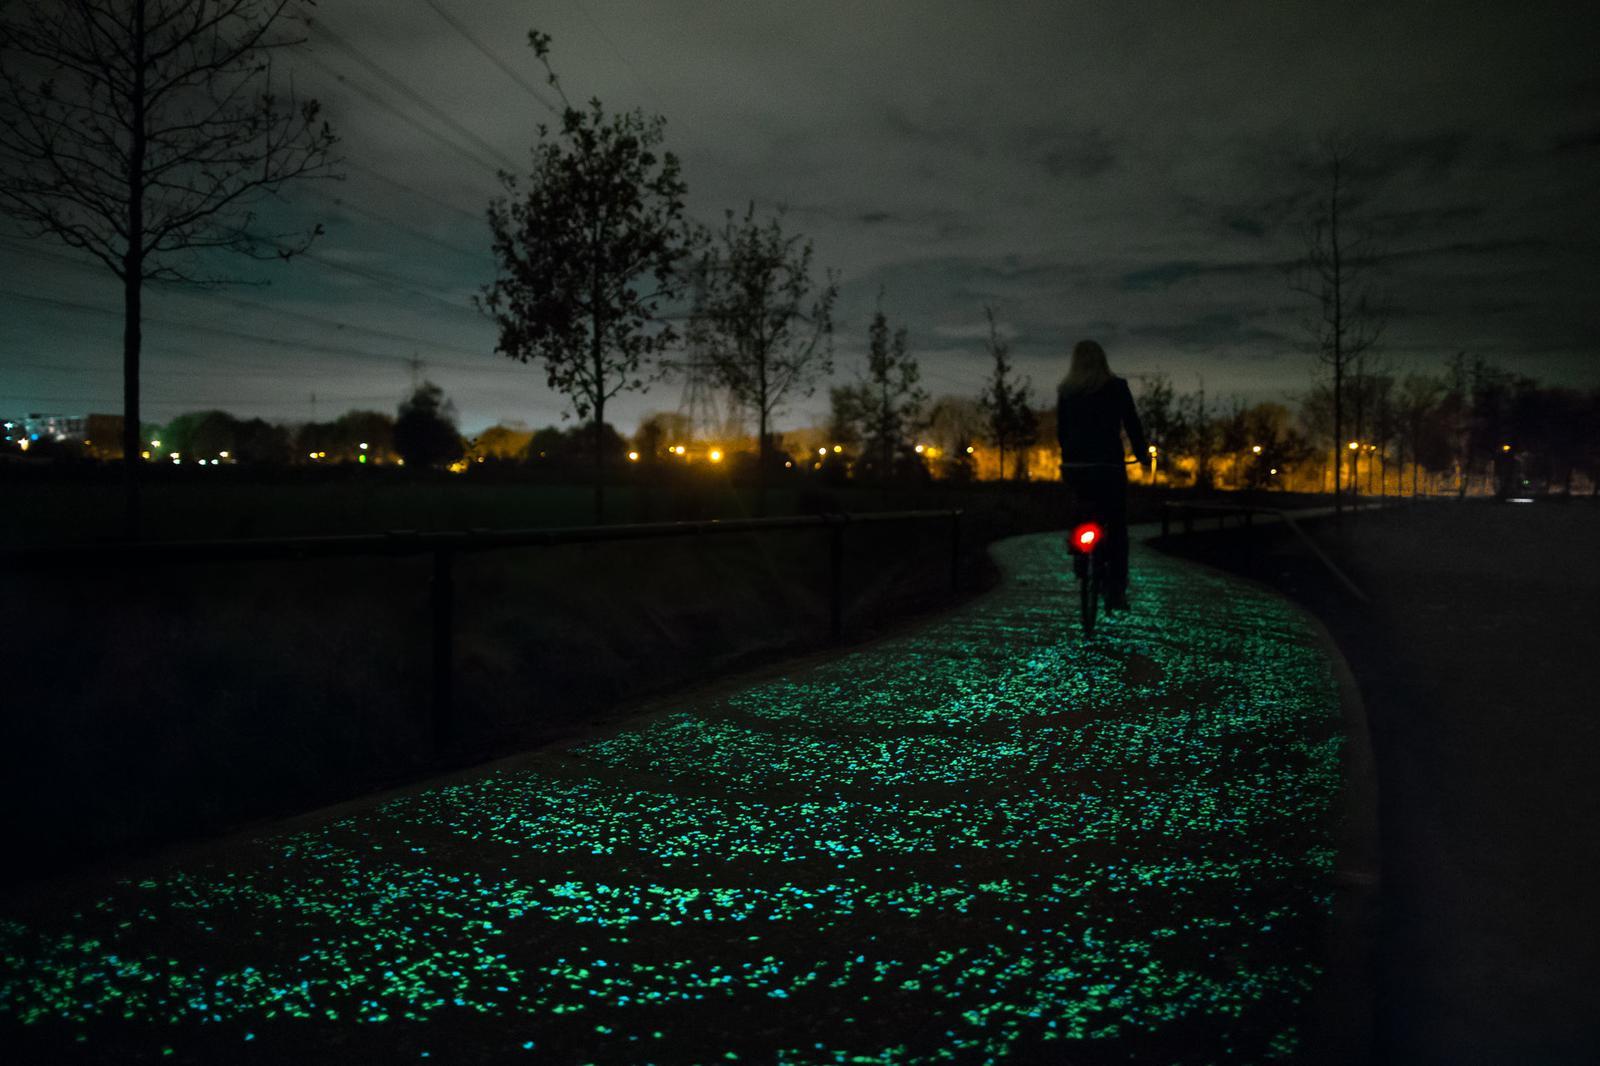 rsz_eindhoven_-van_gogh-roosegaarde_fietspad